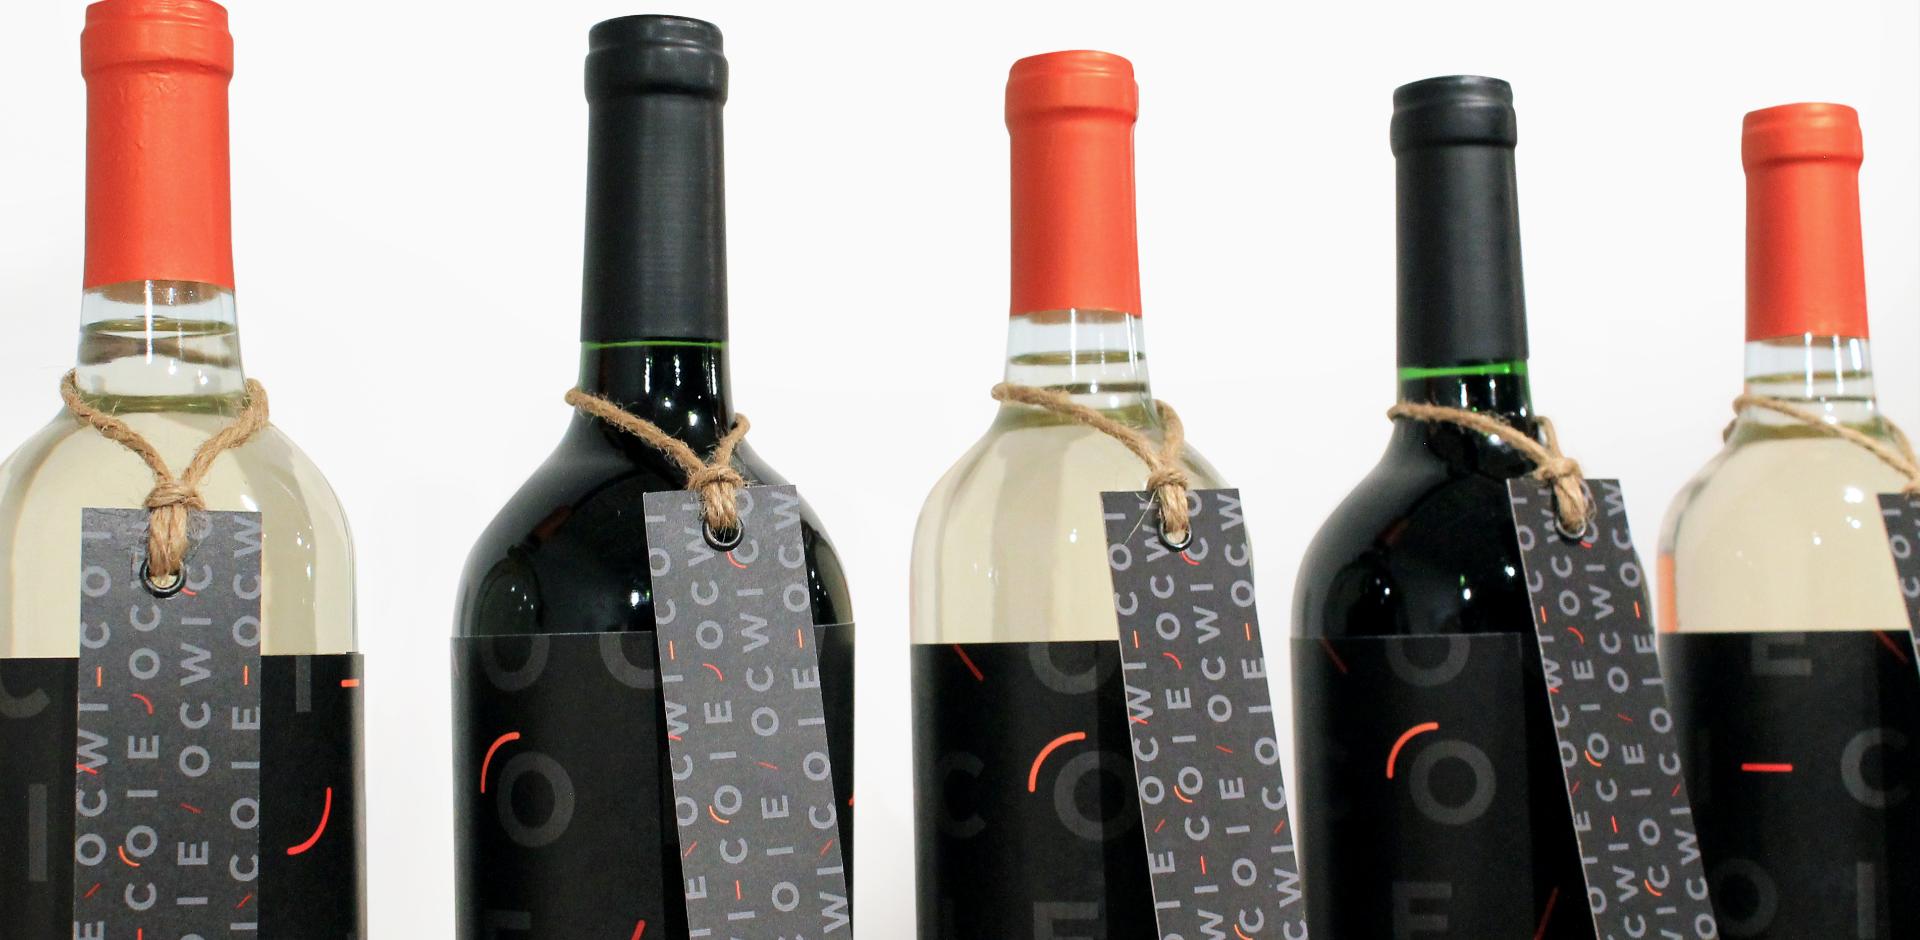 Ontario Centre for Workforce Innovation - Packaging Design - Wine Bottles